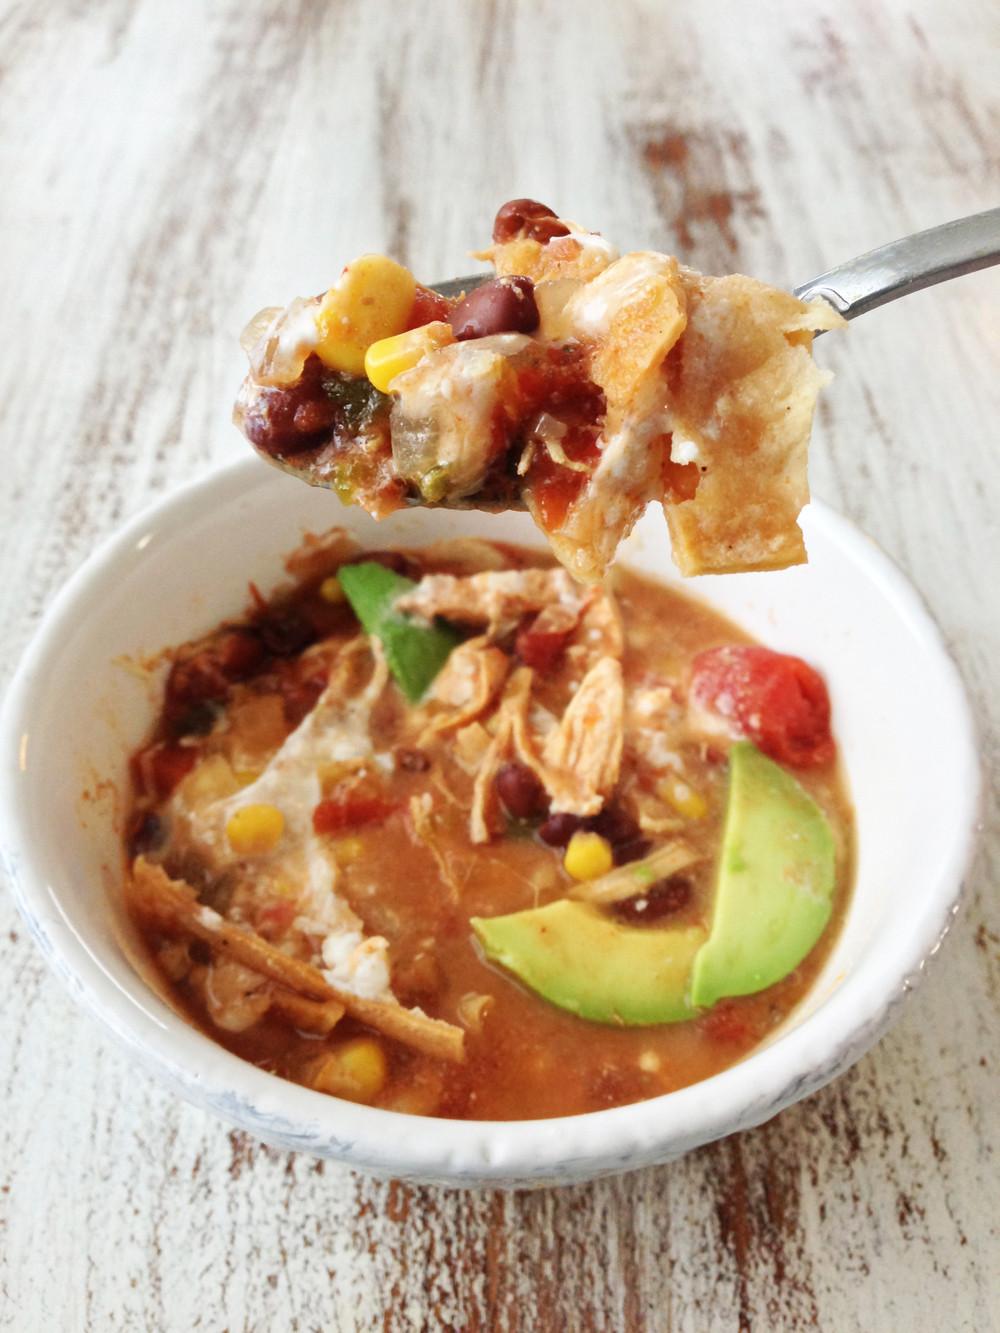 Healthy Chicken Tortilla Soup Crock Pot  Healthified Crock Pot Chicken Tortilla Soup — The Skinny Fork